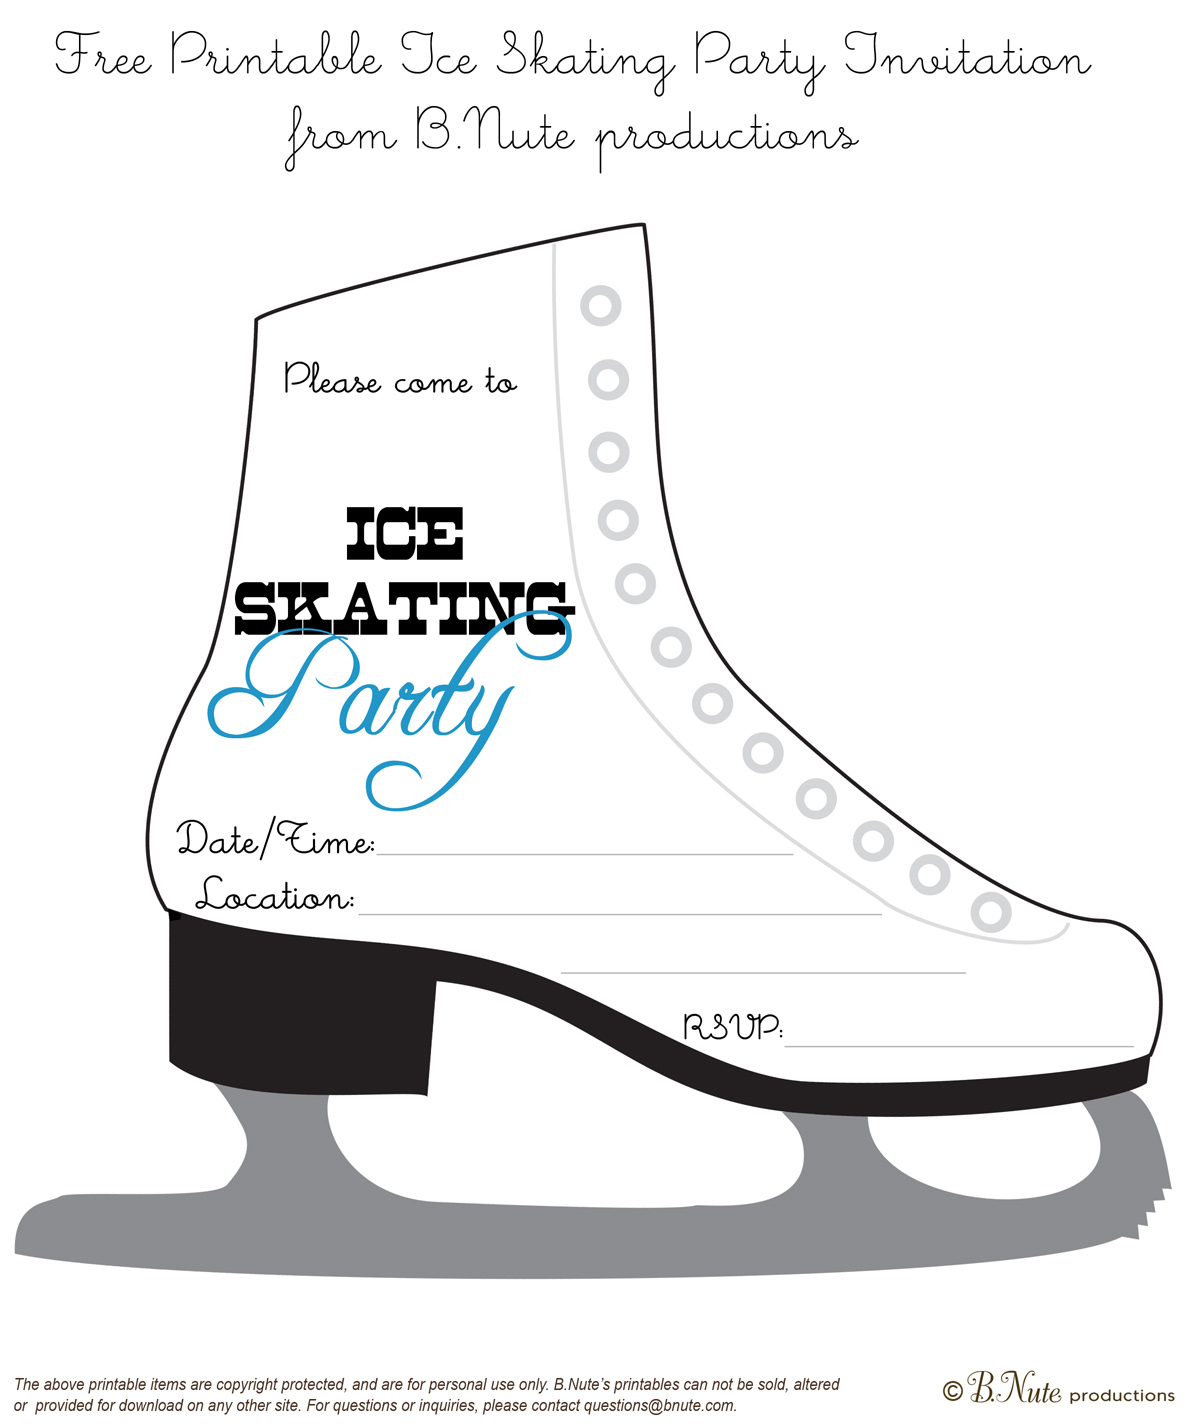 Free Printable Ice Skating Party Invitations From Bnute And Get - Free Printable Skating Invitations